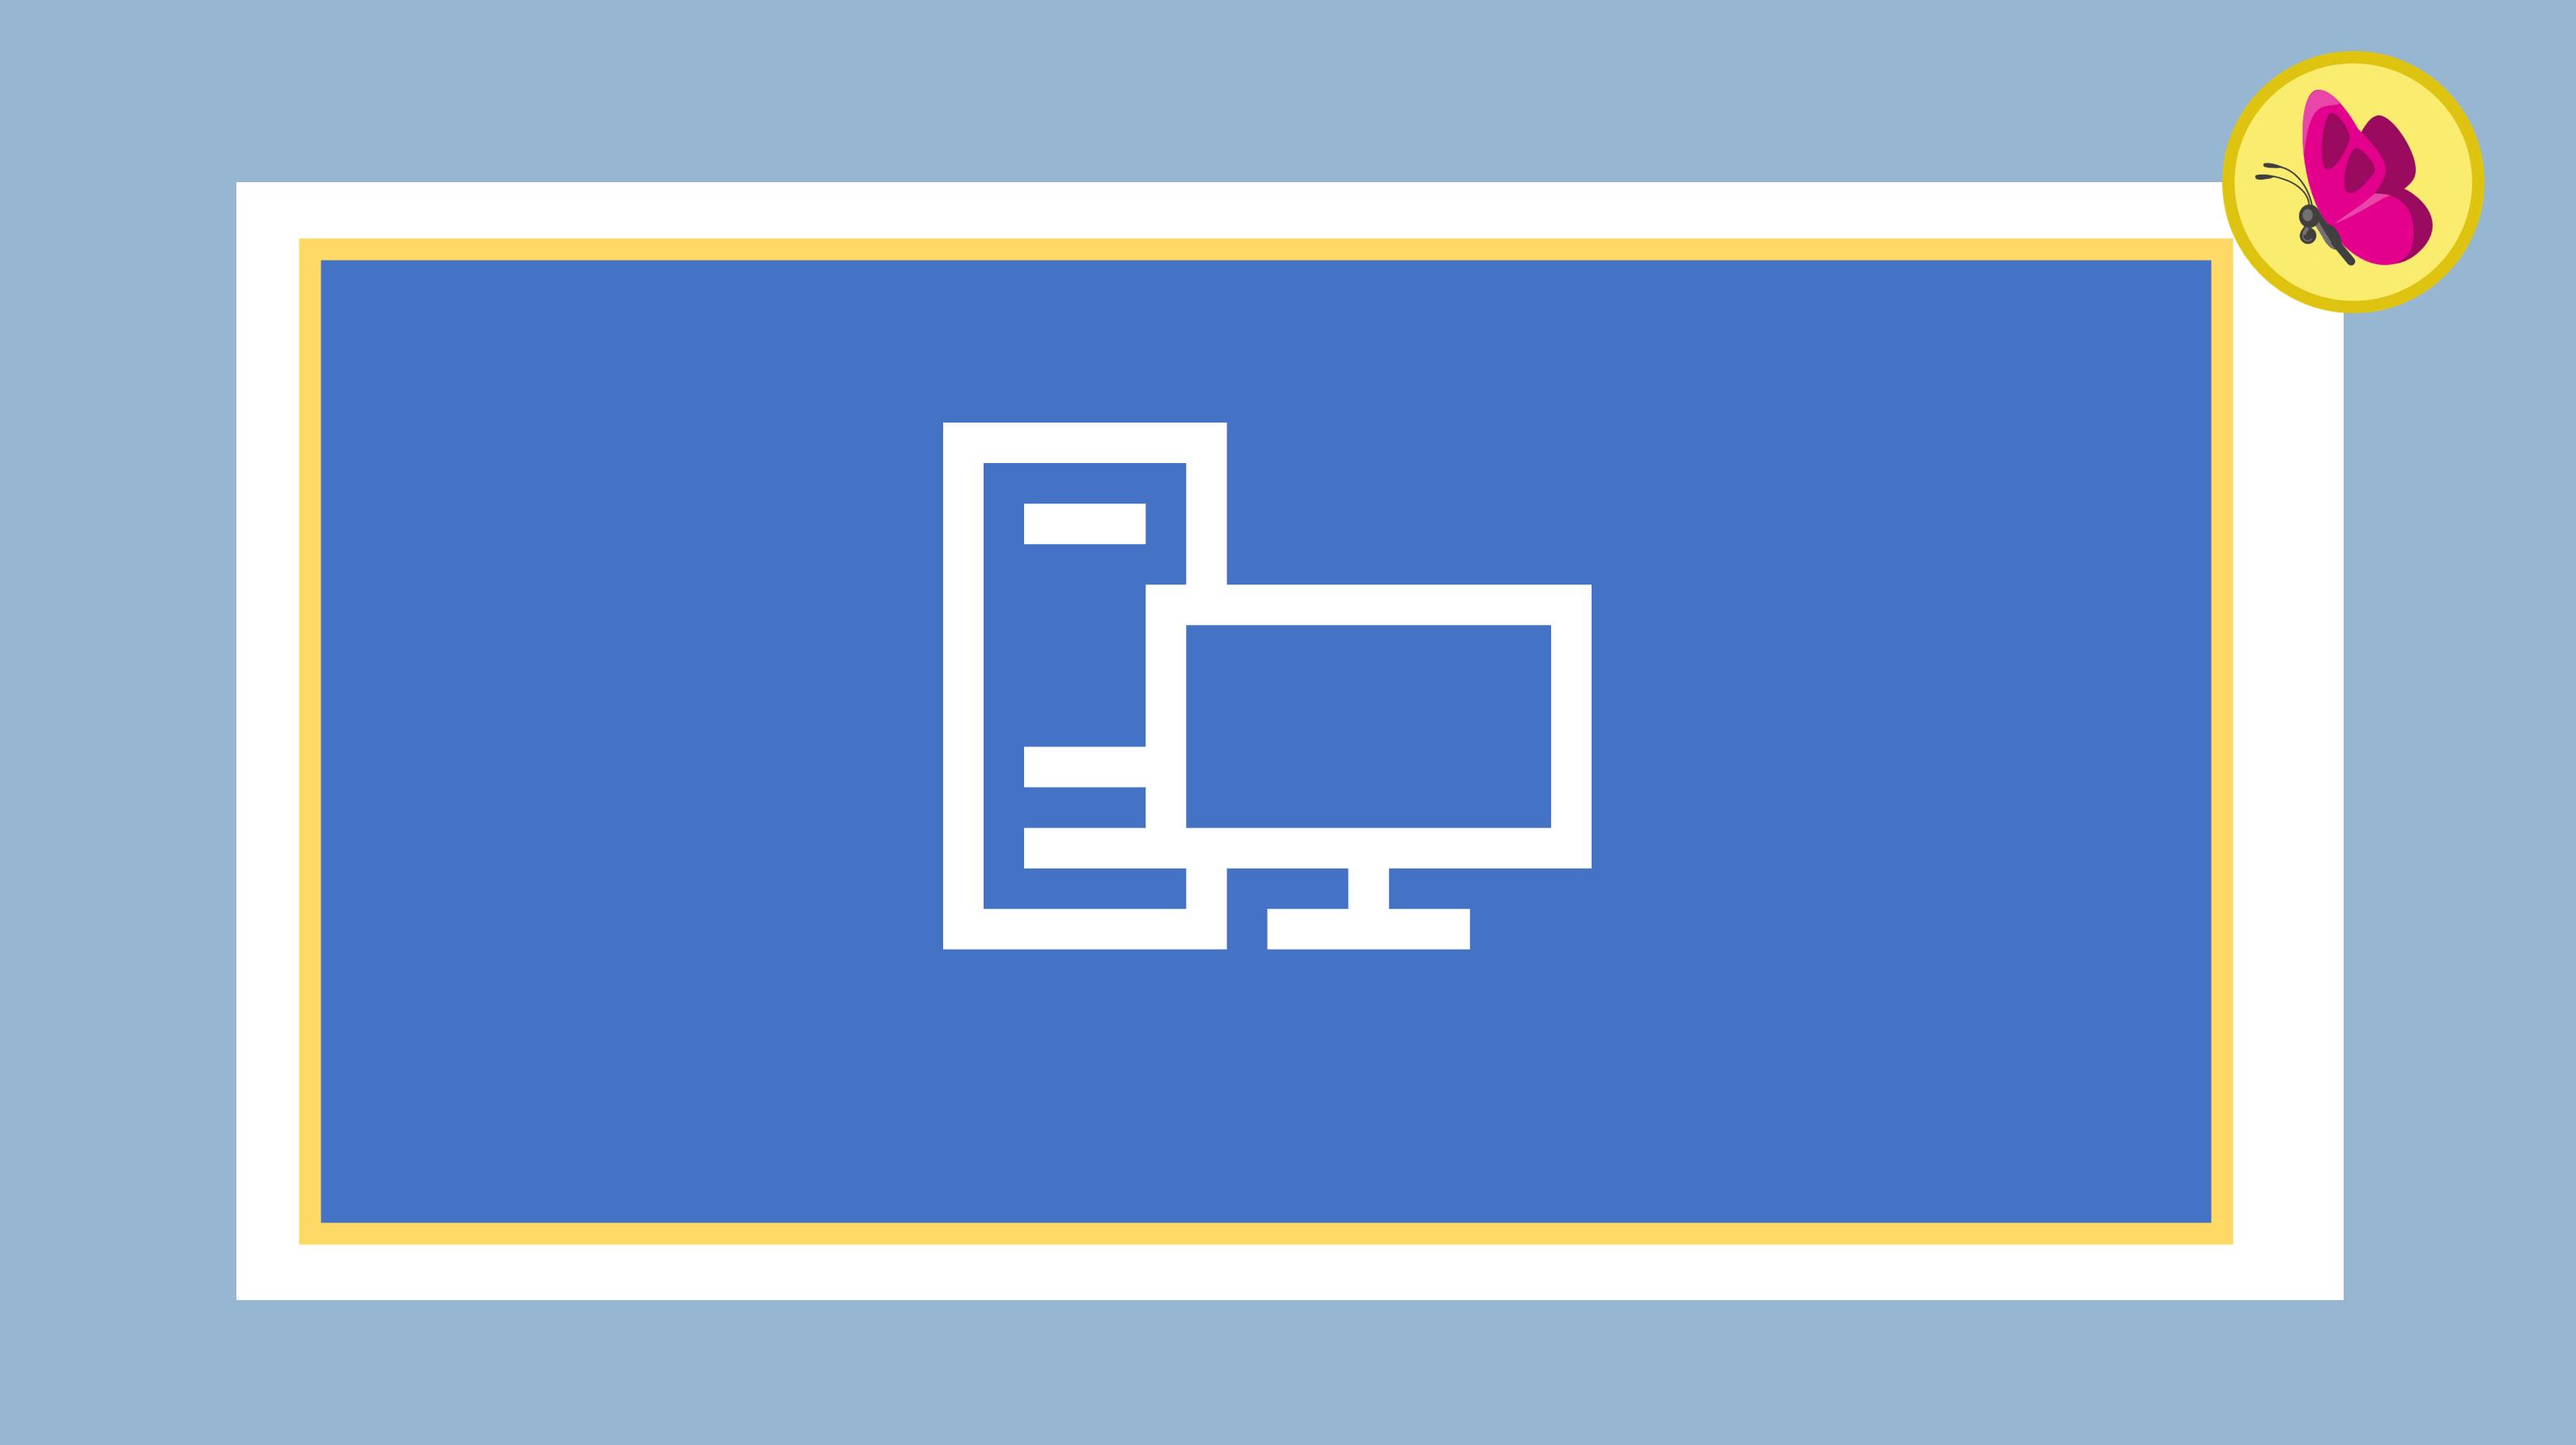 Optimize/Defrag your storage devices